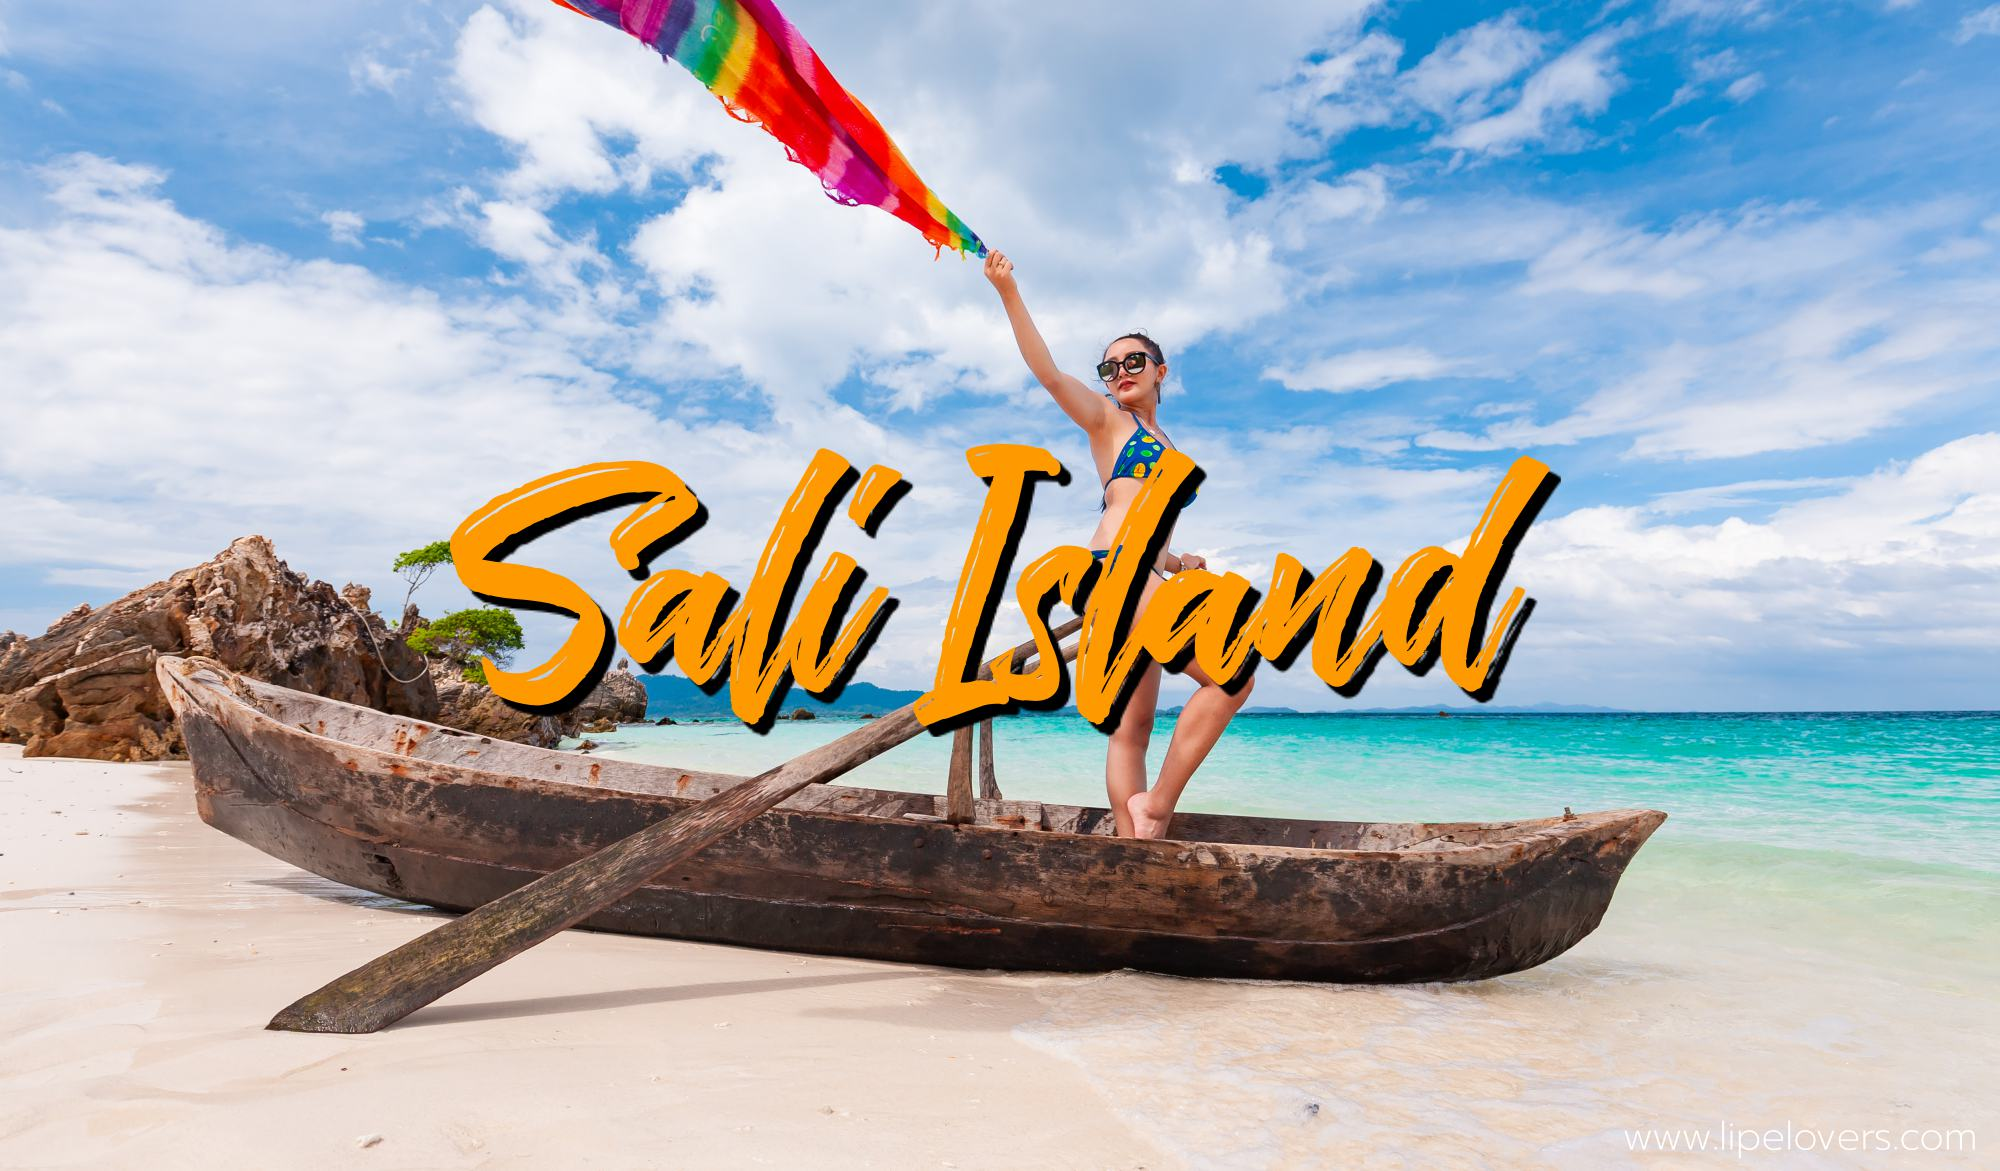 Sali island